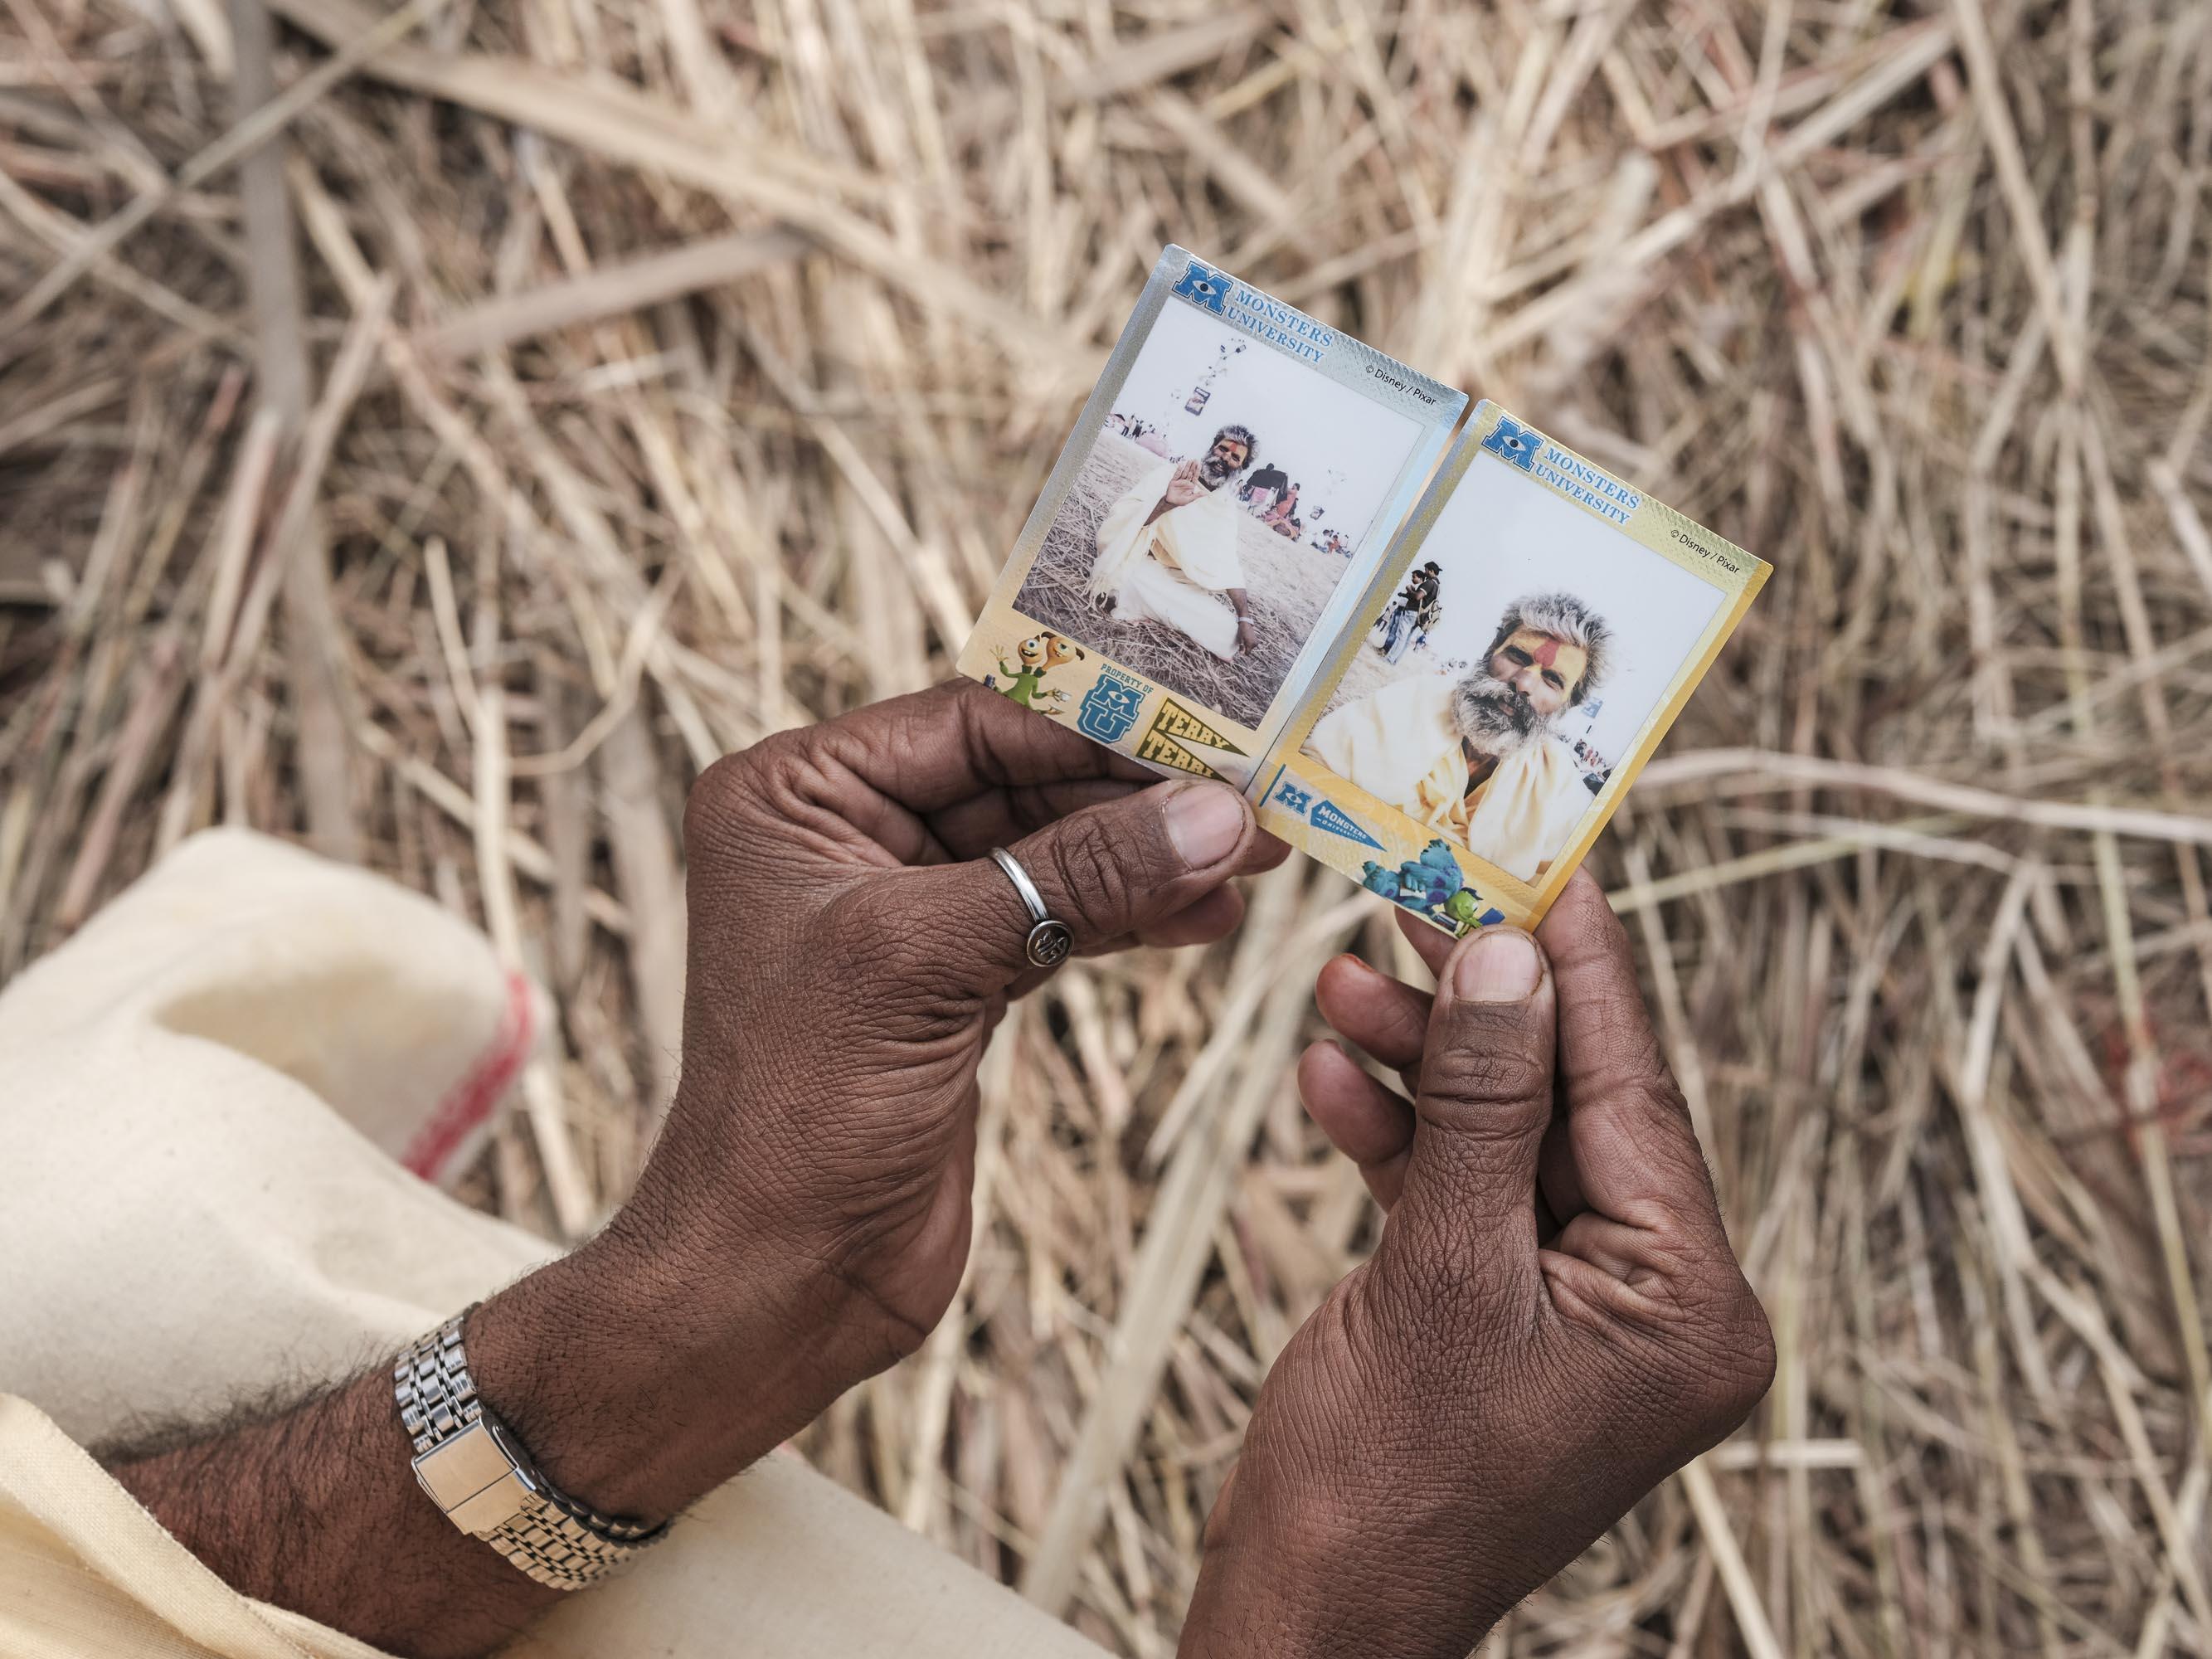 instax fujifilm pilgrims Kumbh mela 2019 India Allahabad Prayagraj Ardh hindu religious Festival event rivers photographer jose jeuland photography